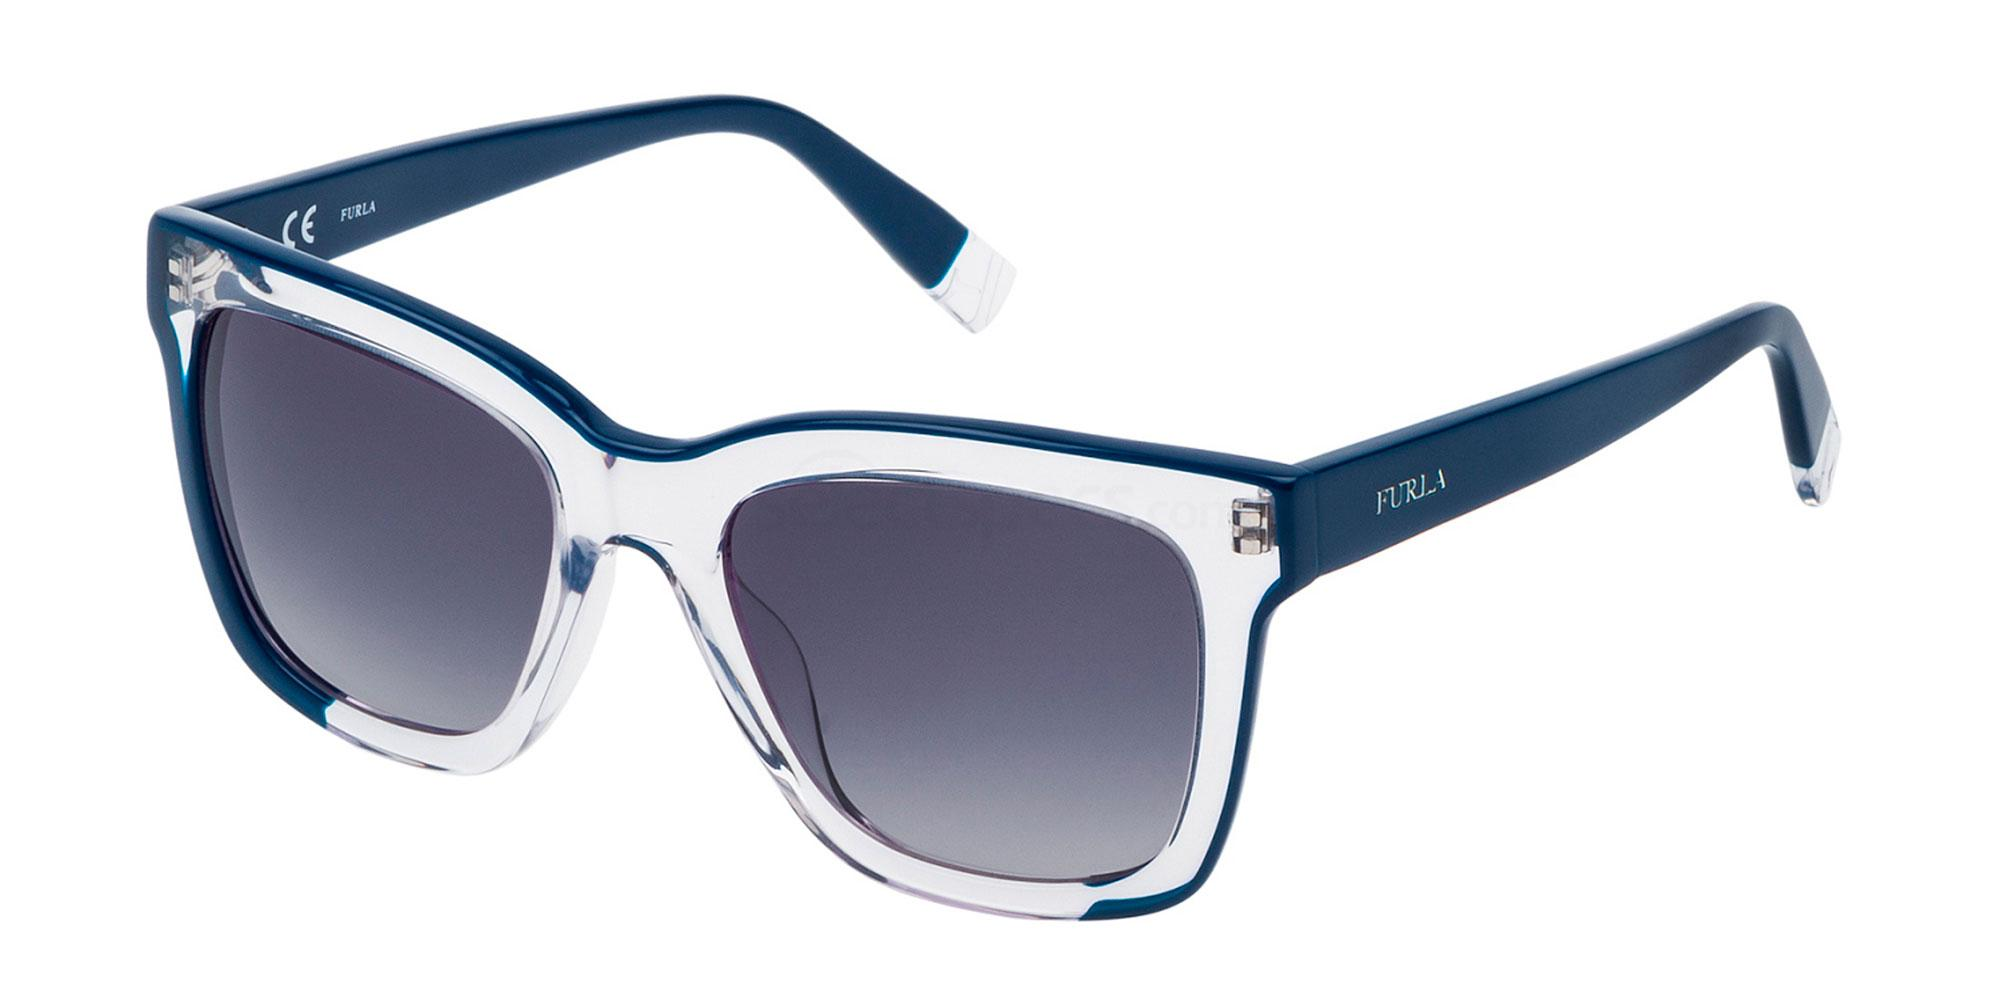 0D82 SFU069 Sunglasses, Furla